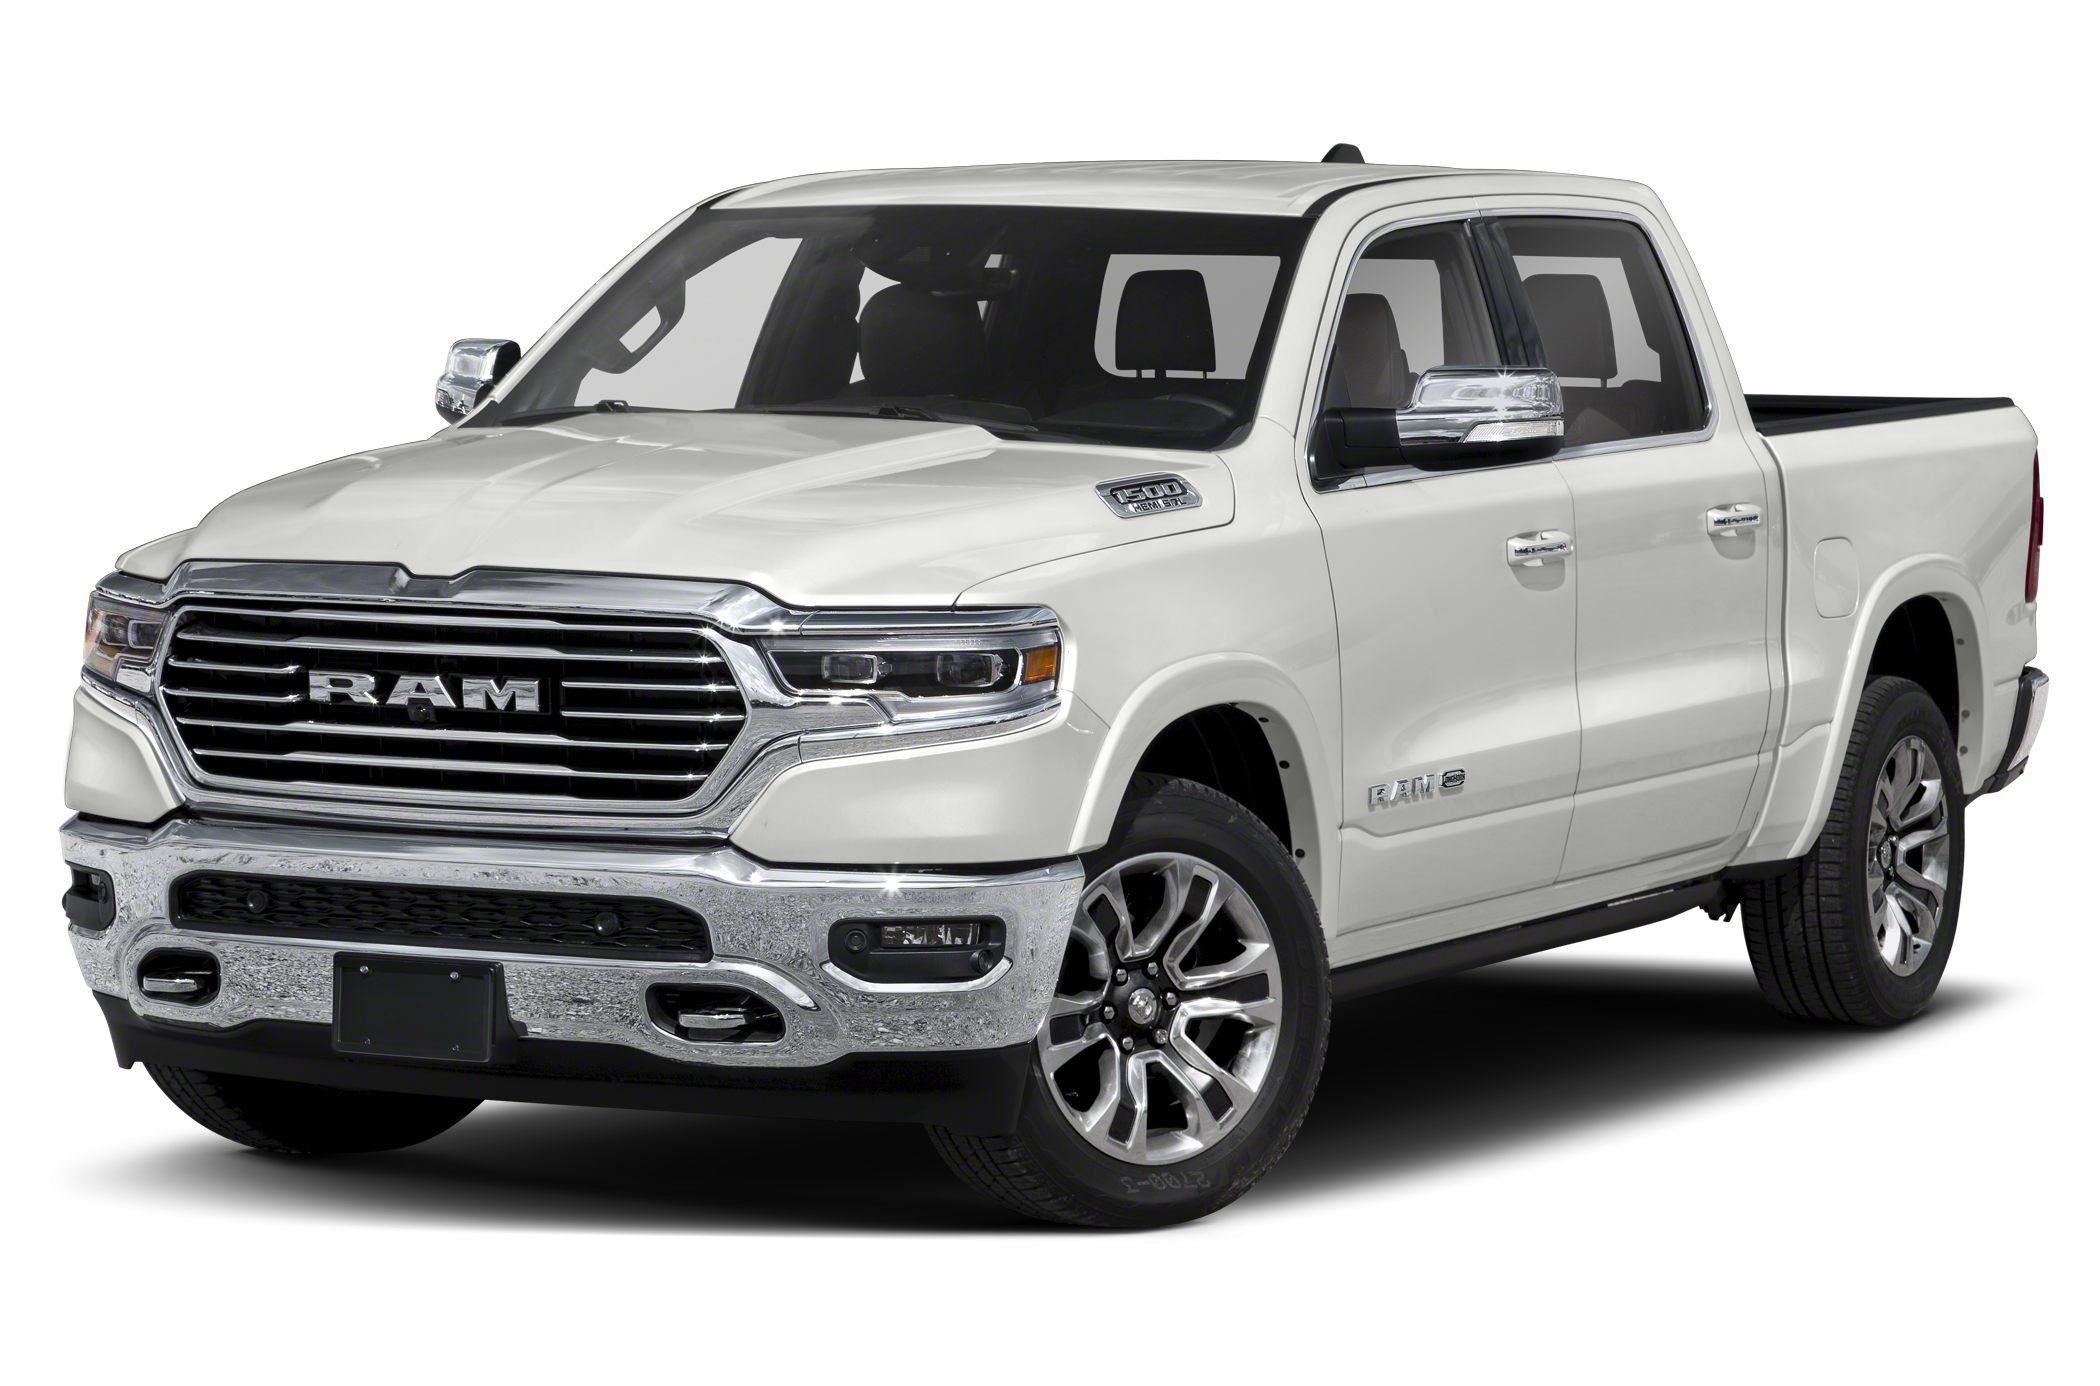 2021 kia k900 performance in 2020  jeep gladiator jeep kia